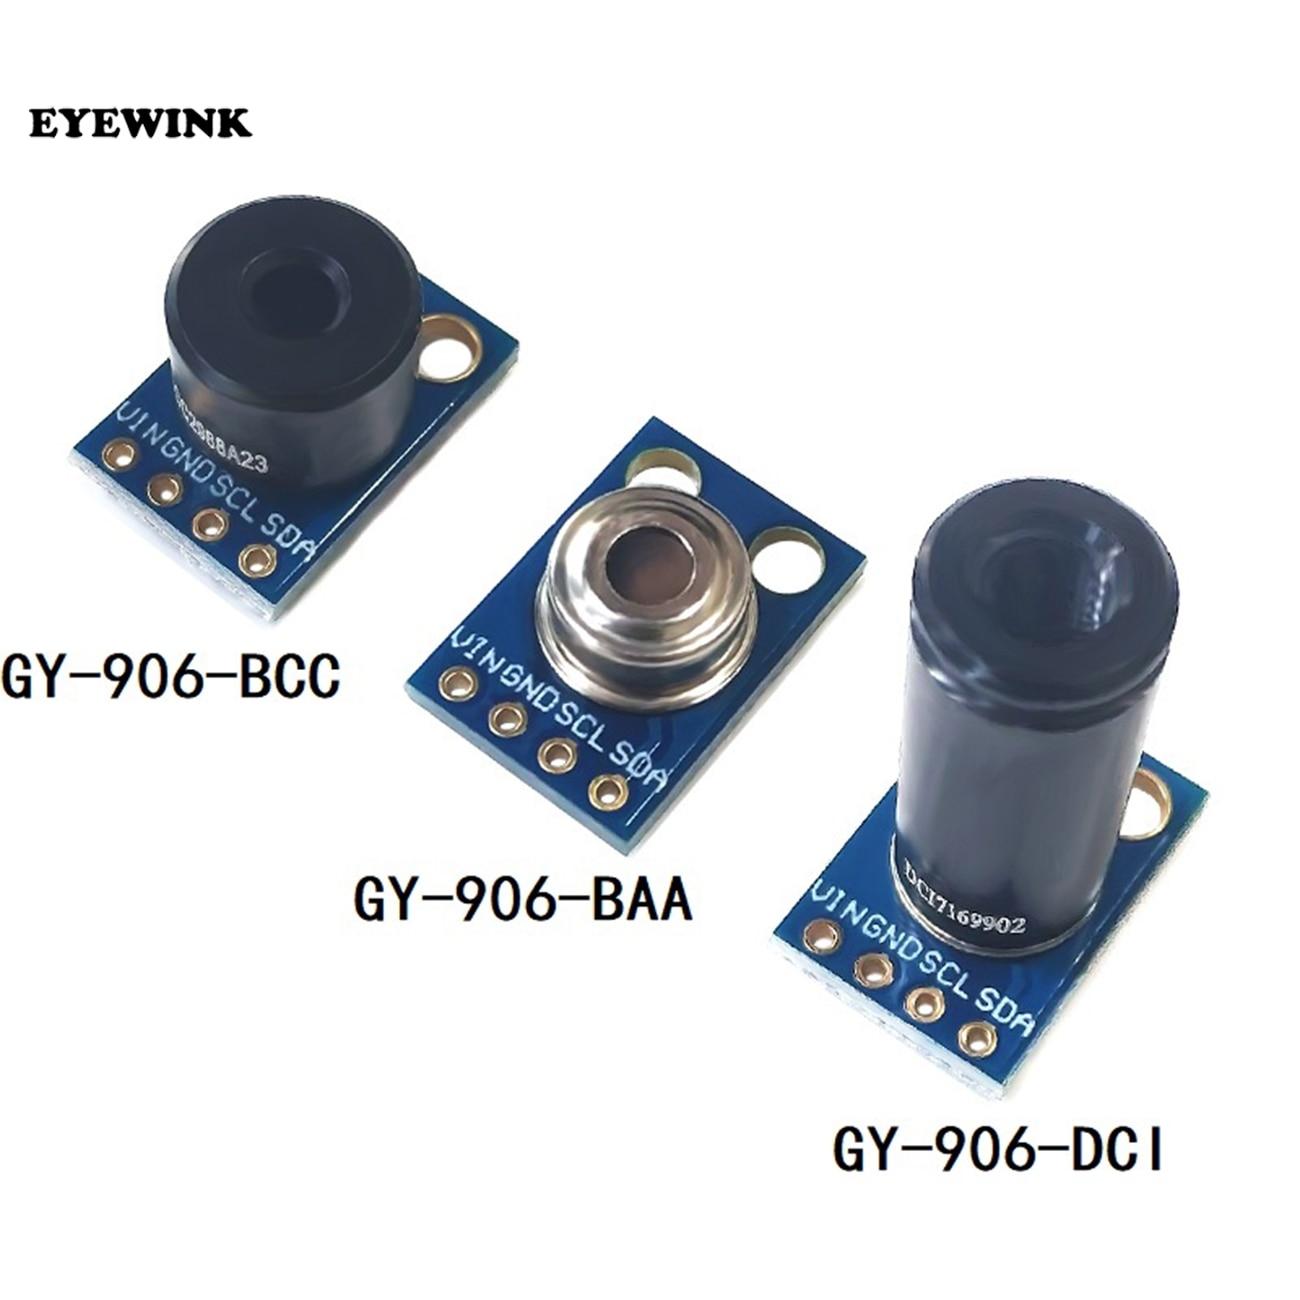 MLX90614 GY906 MLX90614ESF-BAA Contactless Temperature Sensor Module for Arduino